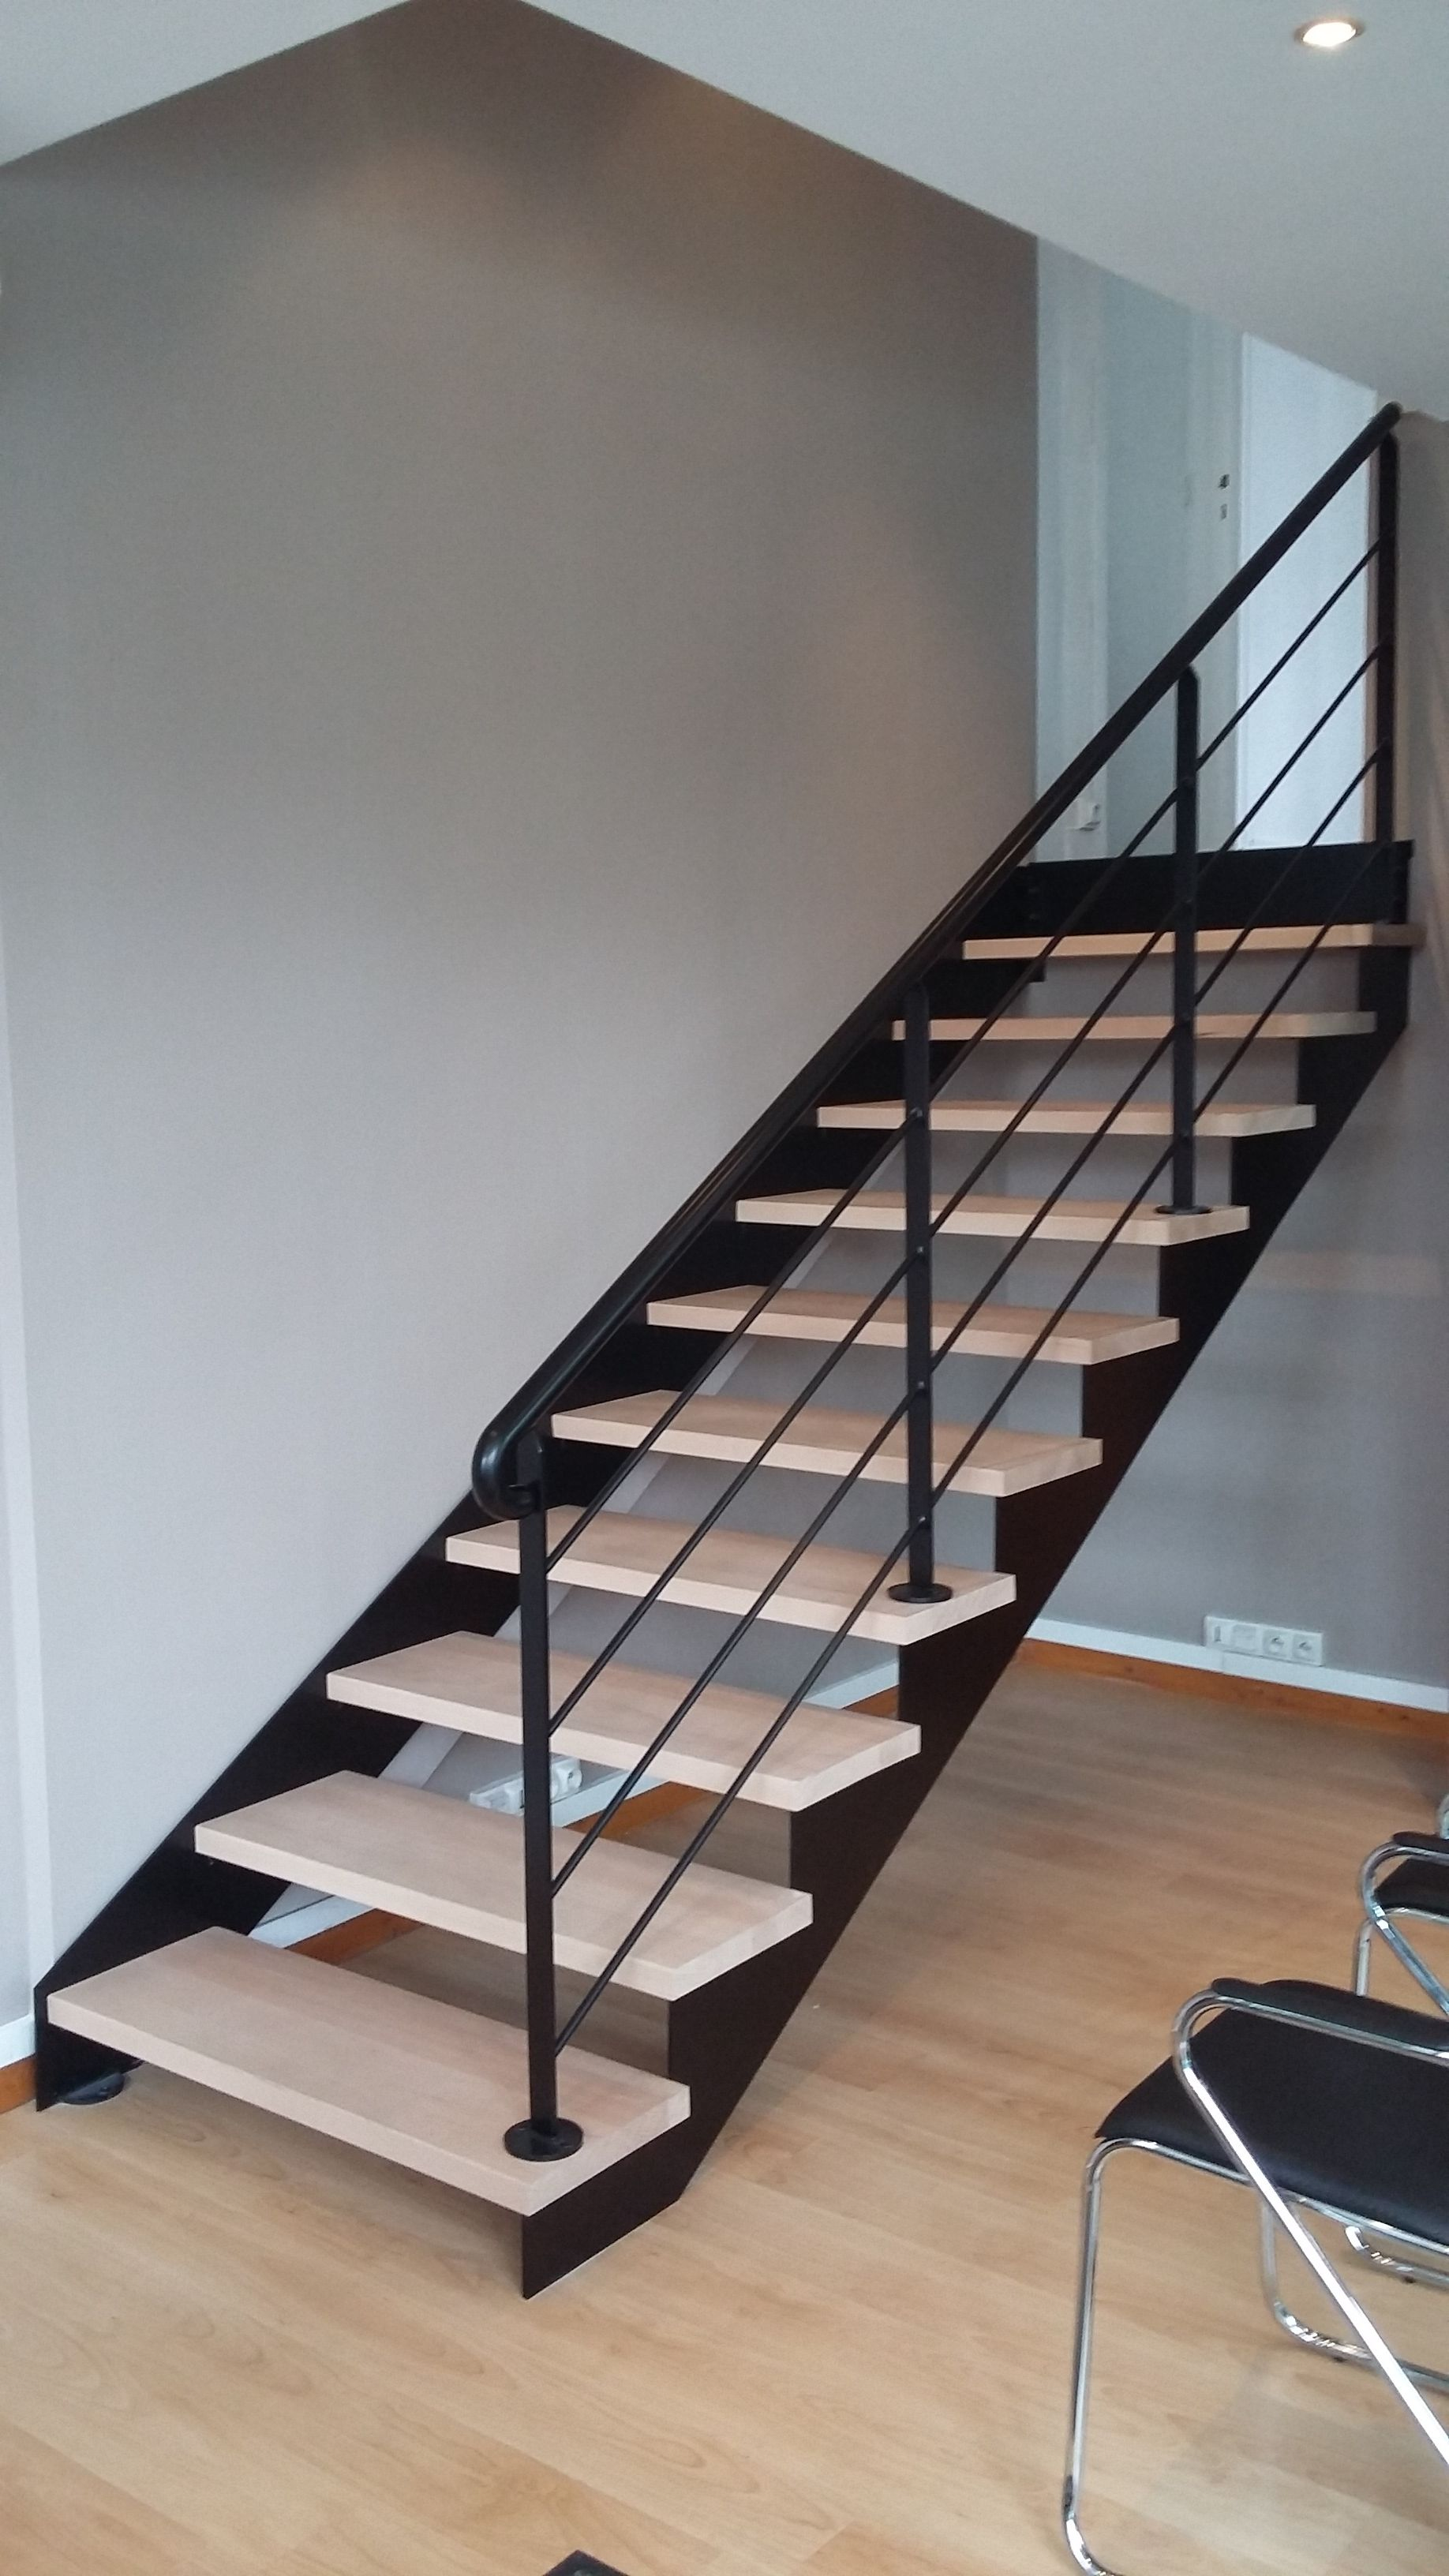 nos verri res escalier design 14 escalier limon fer plat escalier limon pinteres. Black Bedroom Furniture Sets. Home Design Ideas